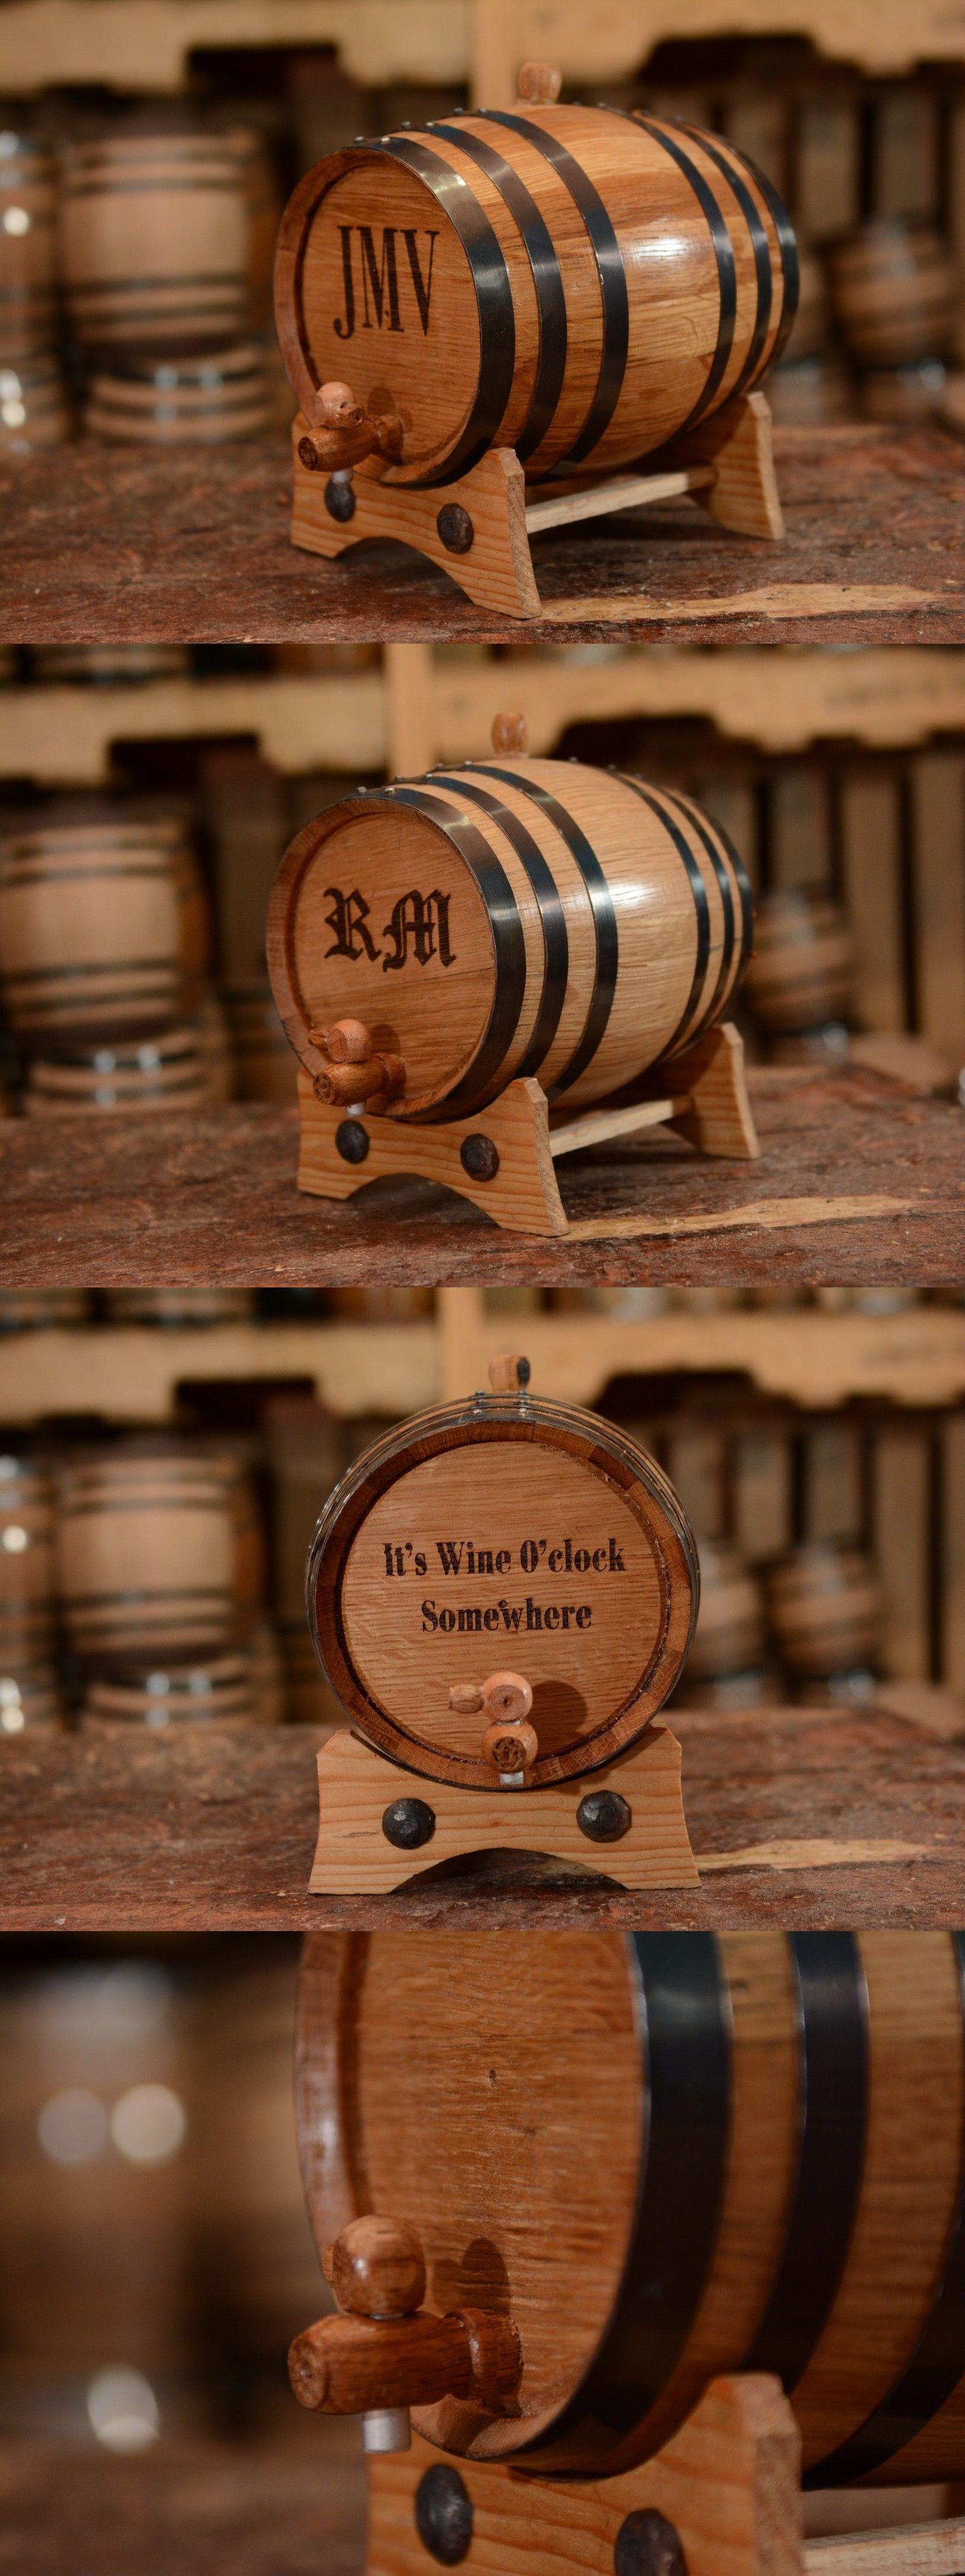 oak wine barrel barrels whiskey. Liquor And Beer Dispensers 103429: 1 Liter   Custom Whiskey Barrel - Personalized Wine Oak Barrels